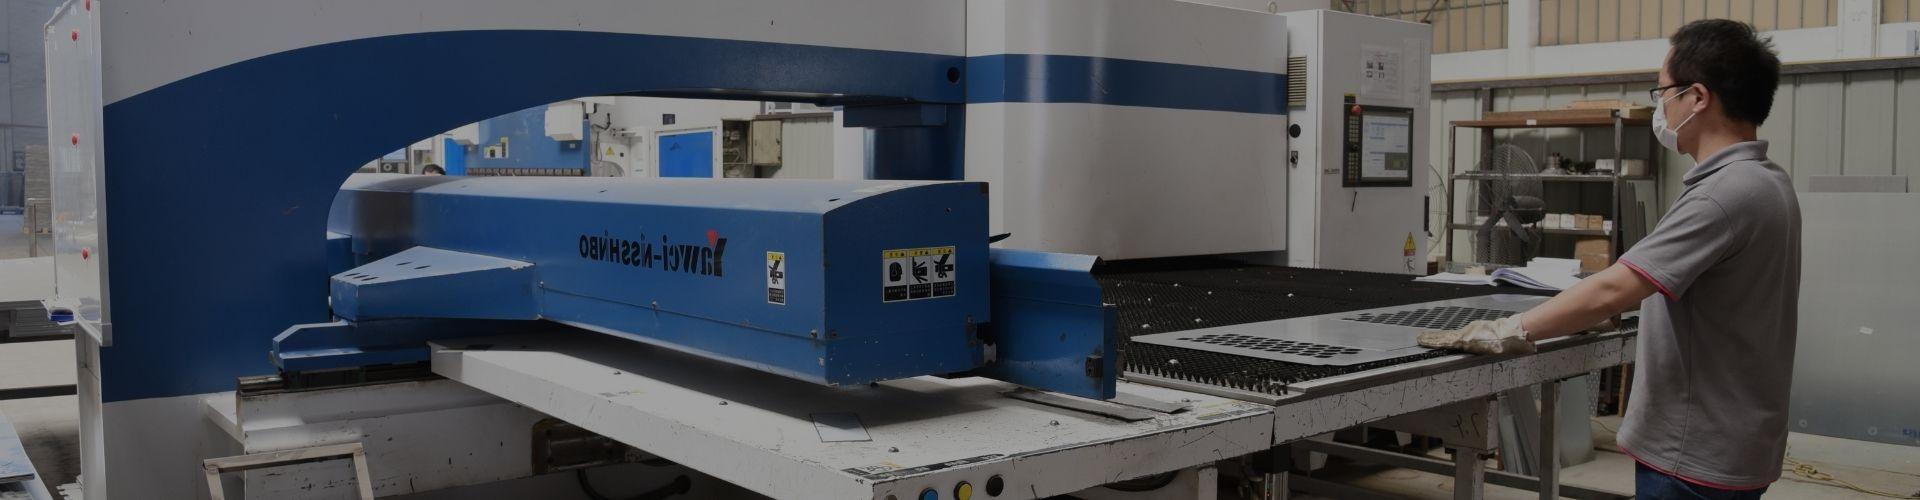 electrical enclosure manufacturing equipment